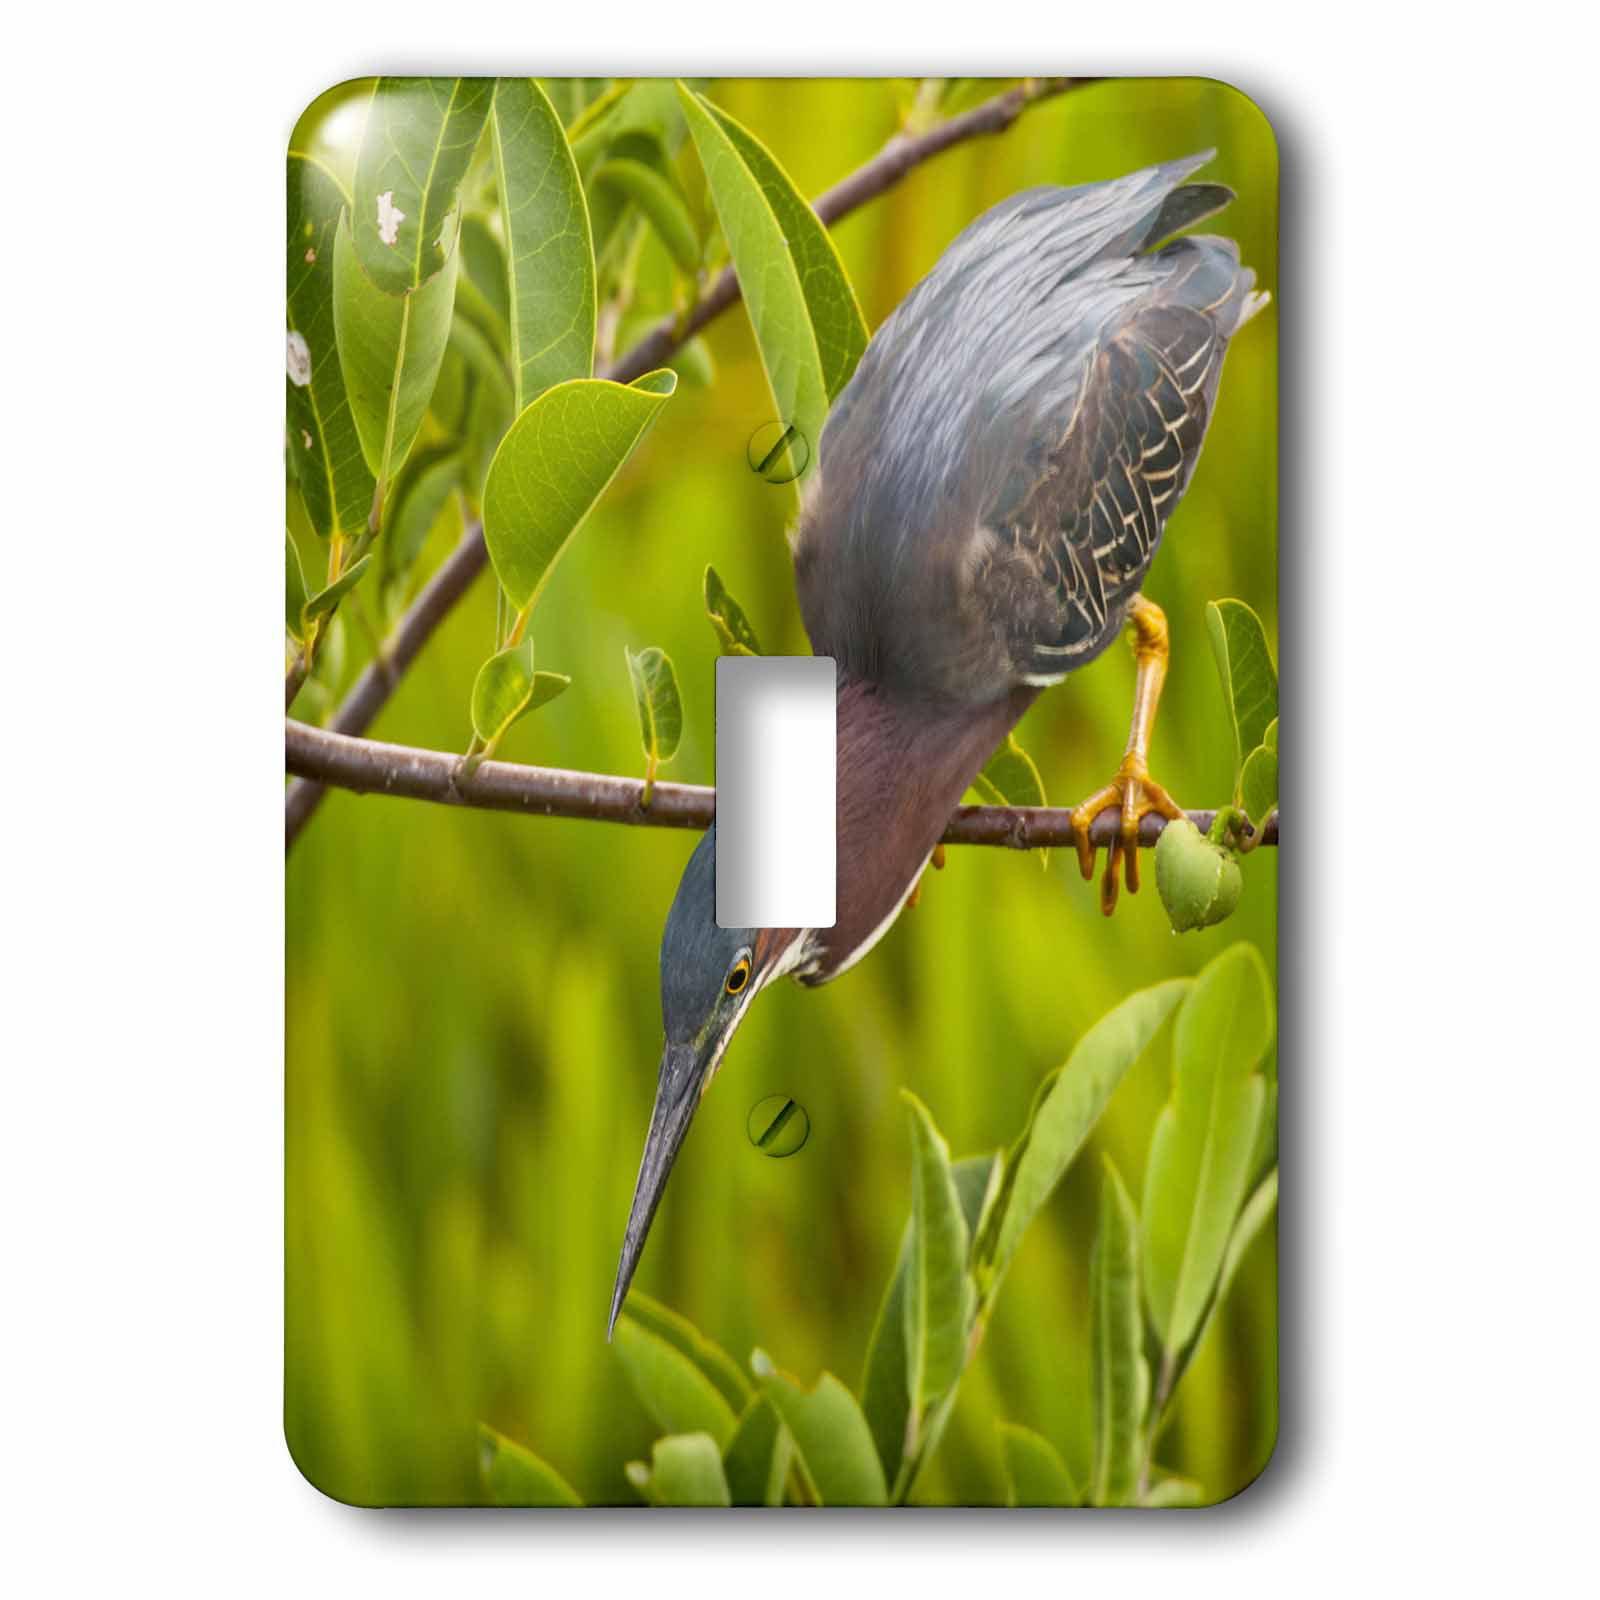 3dRose USA, Florida. Green heron bird hunting - US10 BJY0001 - Jaynes Gallery, 2 Plug Outlet Cover